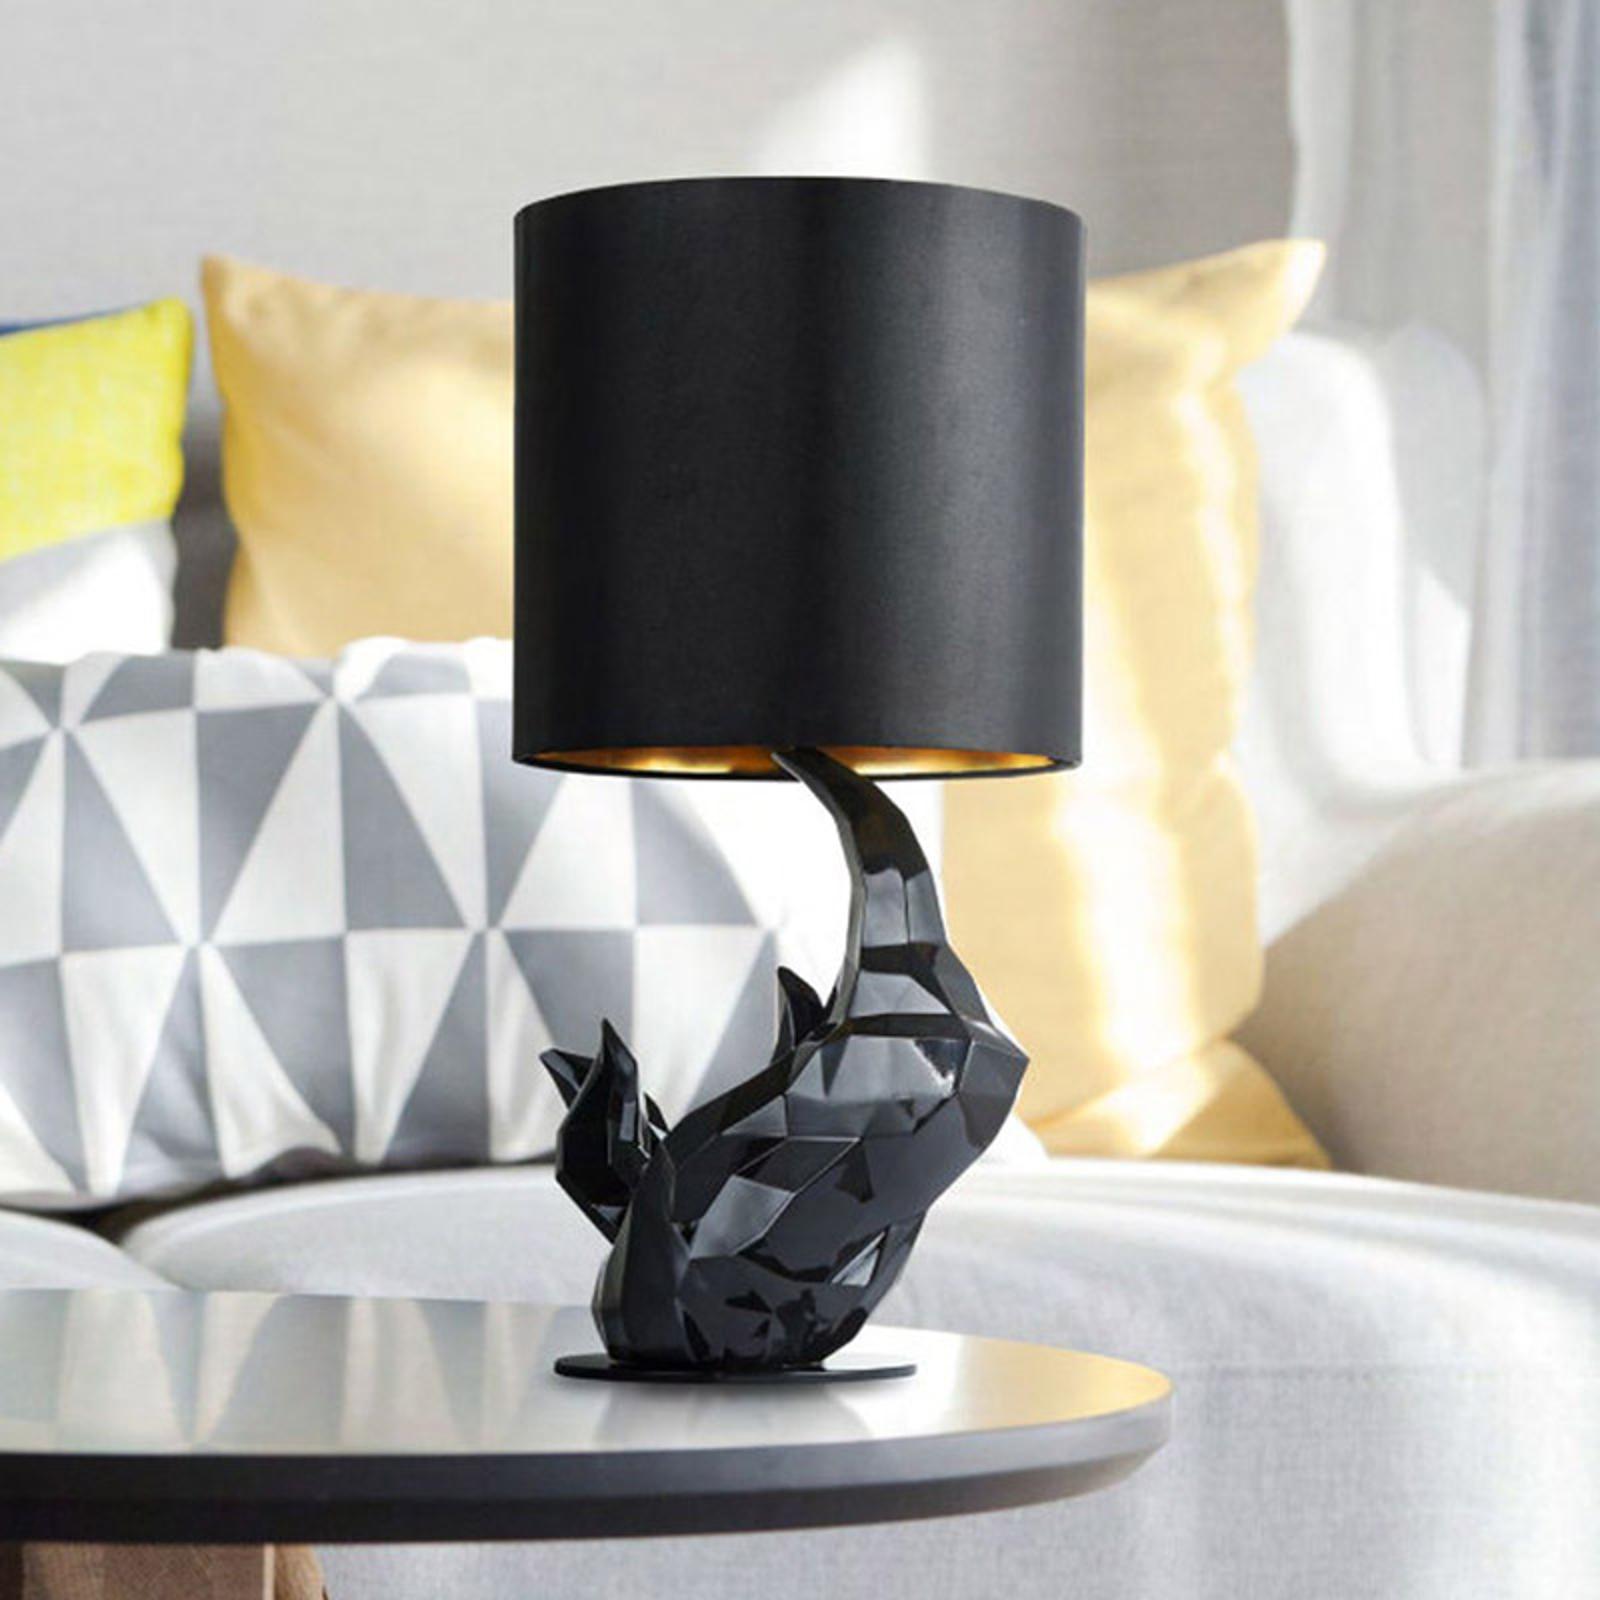 Lampada da tavolo Nashorn nero